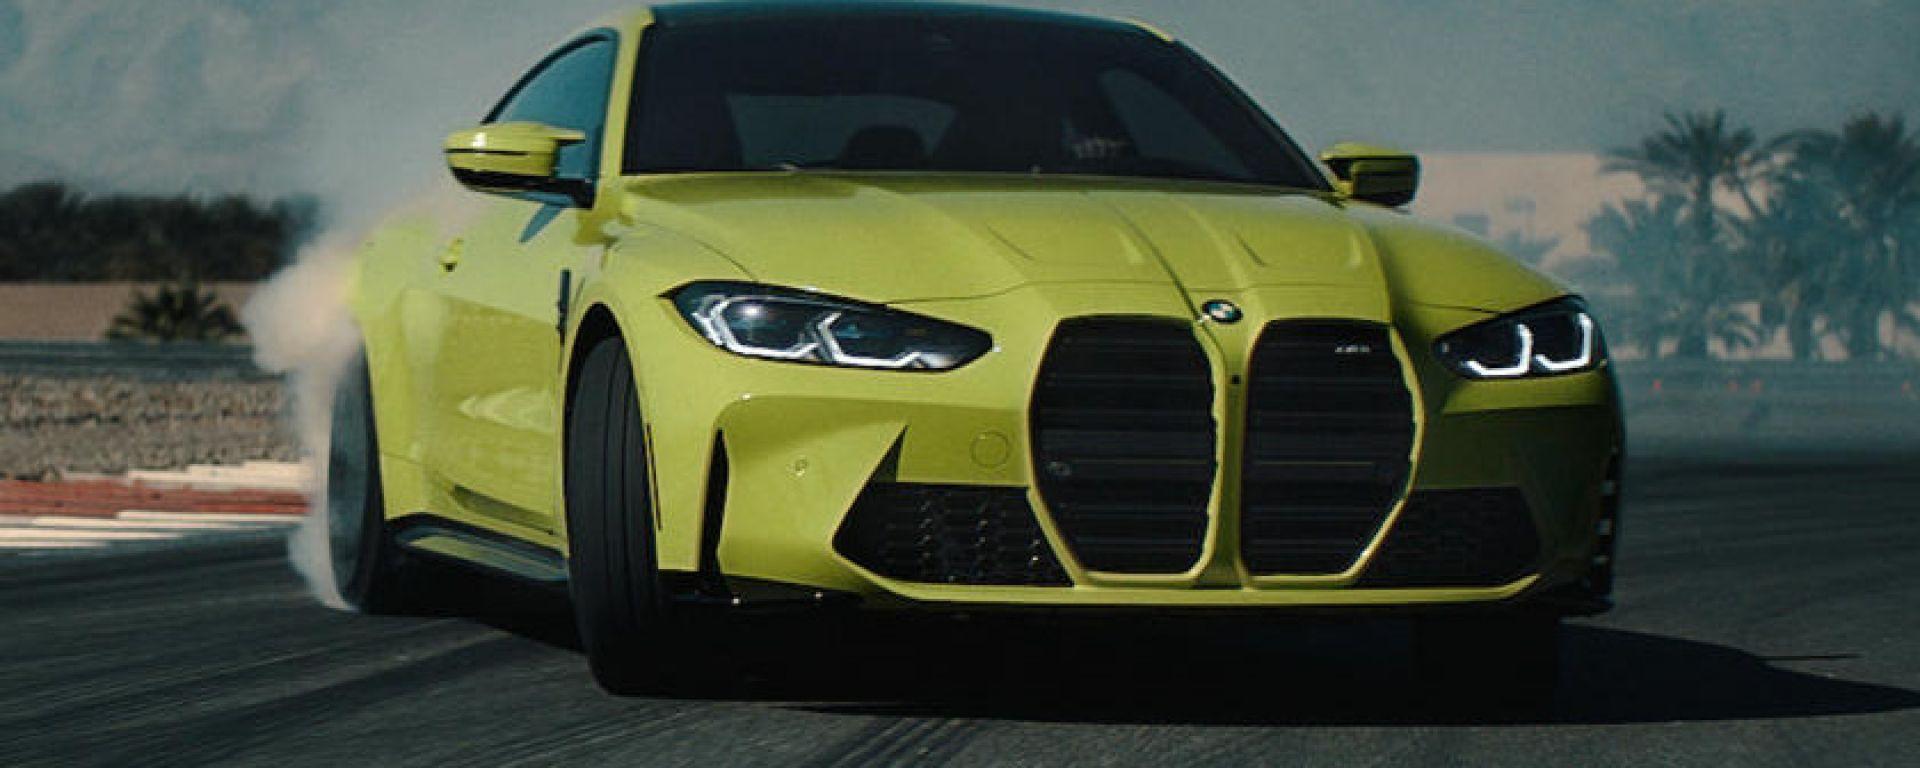 BMW M4 Coupé: in video come si fanno i drift